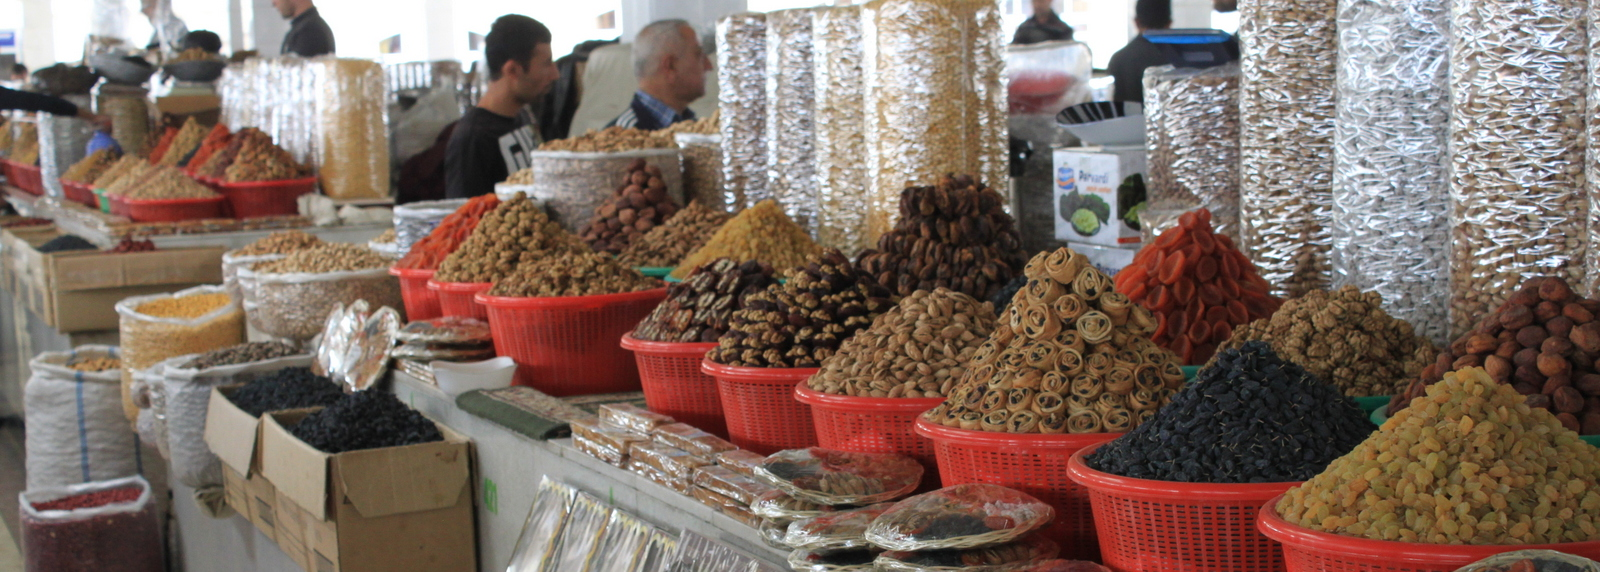 Siob Bazaar Samarkand, Oezbekistan